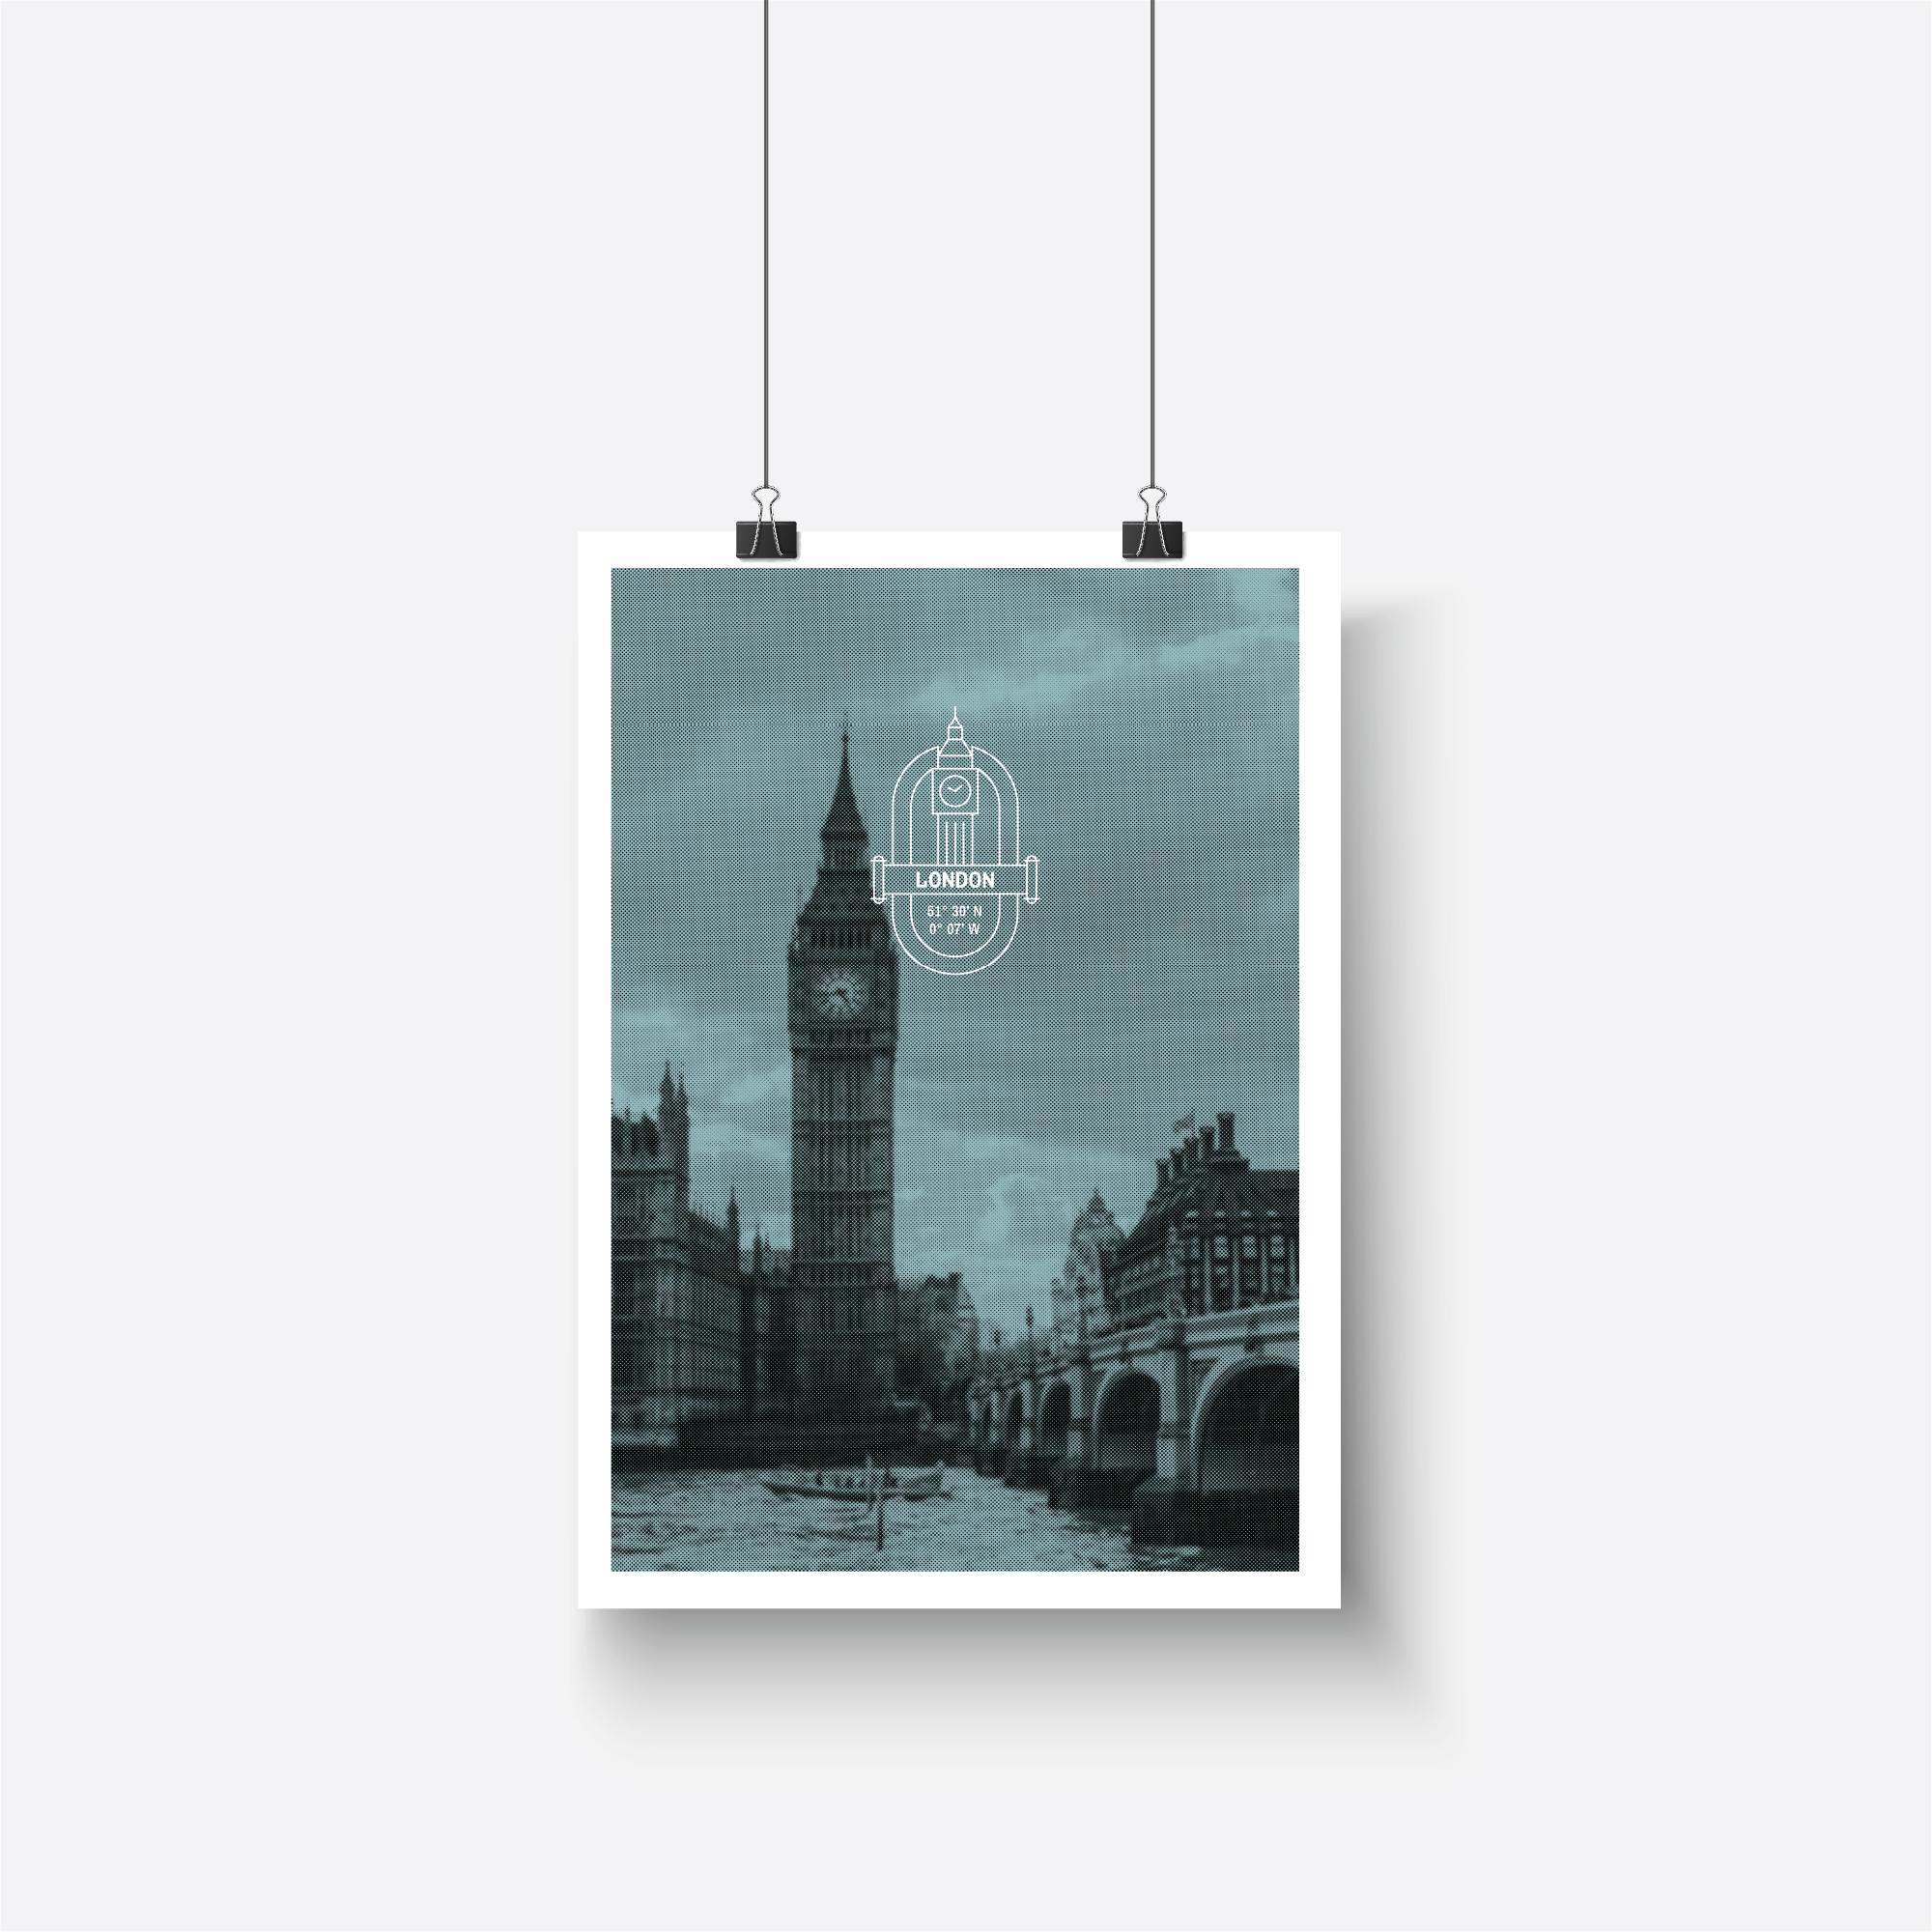 Plakat_London-100